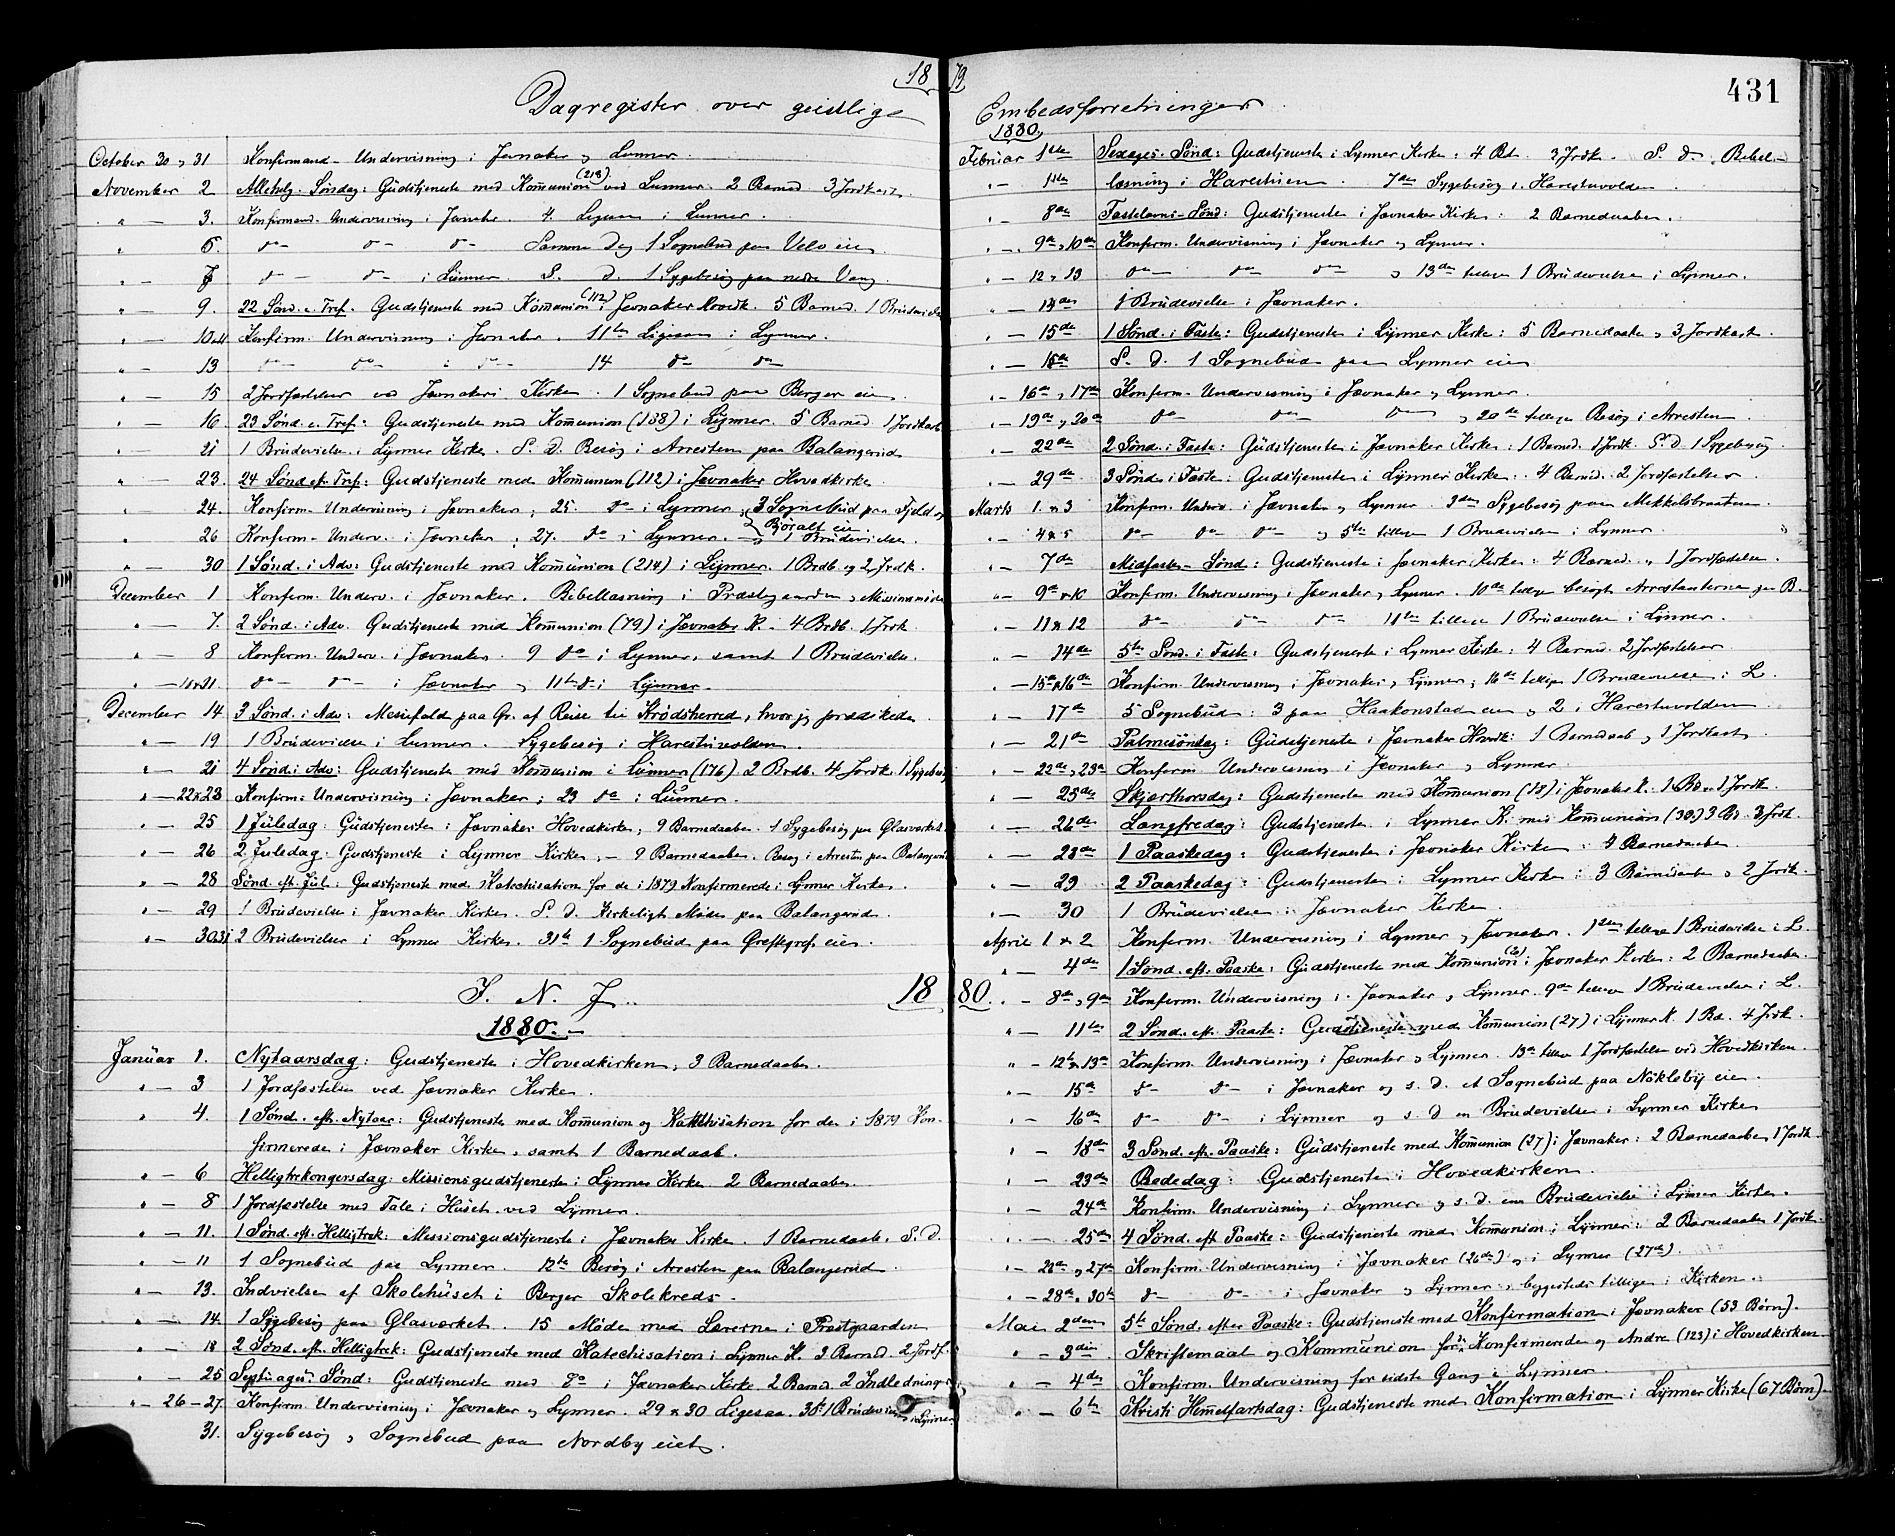 SAH, Jevnaker prestekontor, Ministerialbok nr. 8, 1877-1890, s. 431